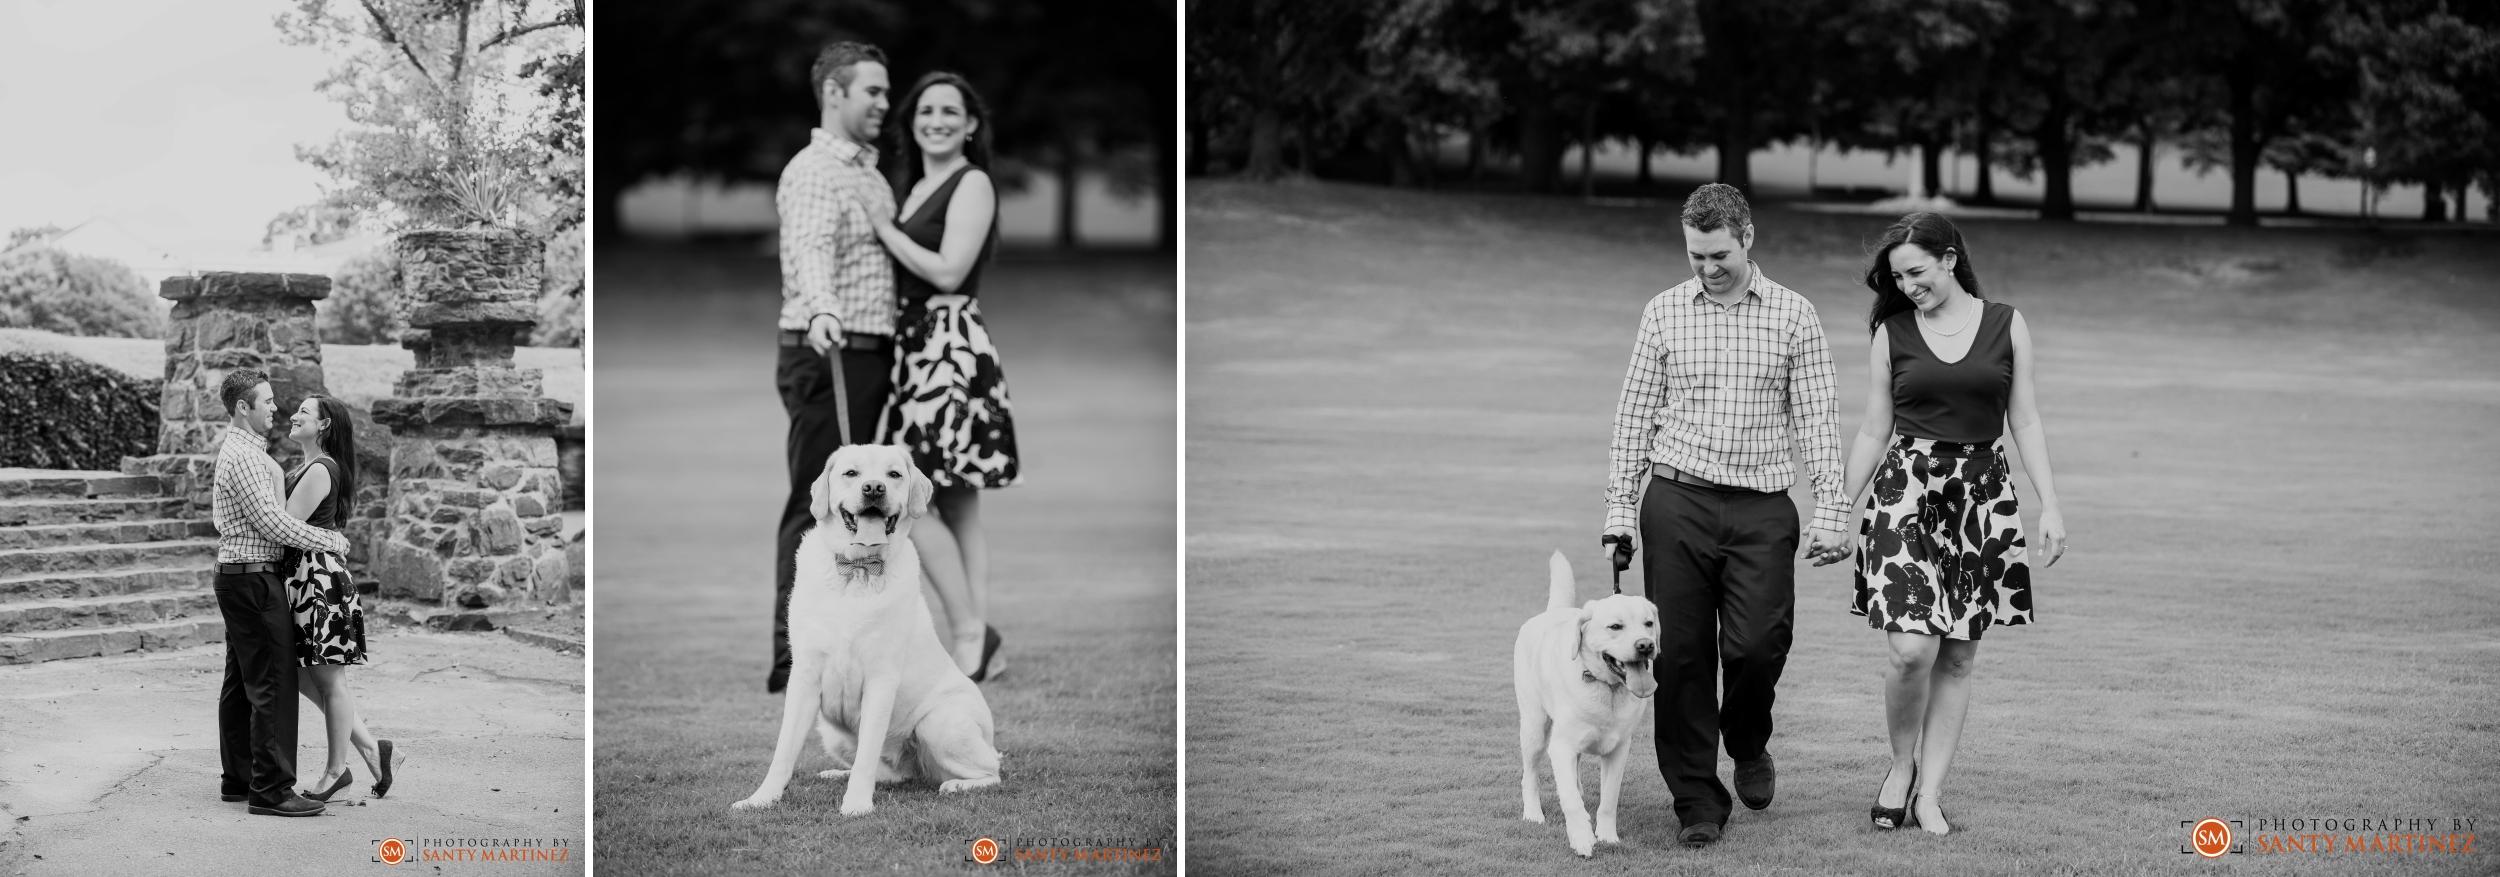 Engagement Session Piedmont Park - Santy Martinez Photography 4.jpg